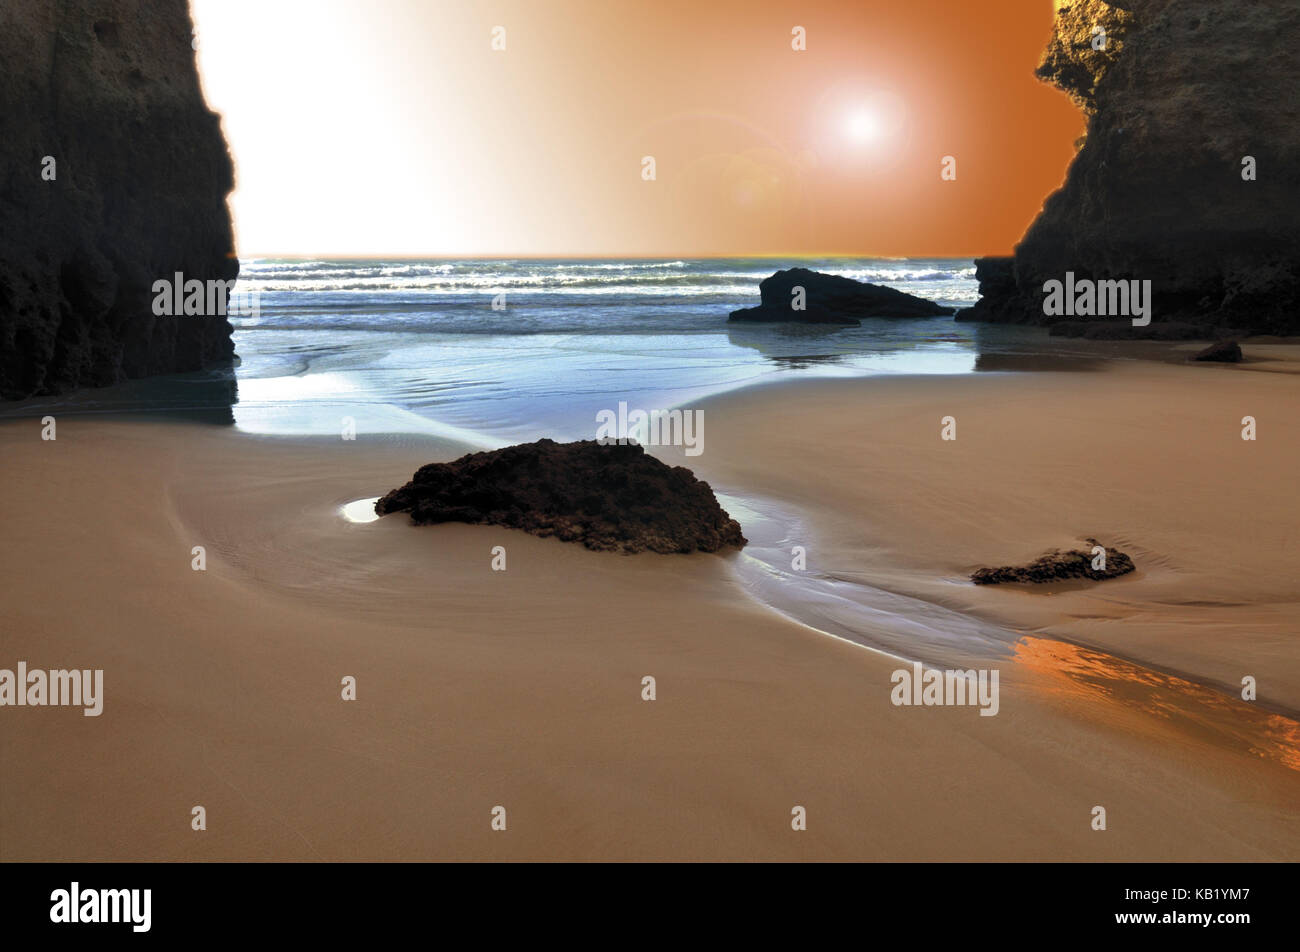 Portugal, Algarve, evening mood on the beach Prainha, - Stock Image